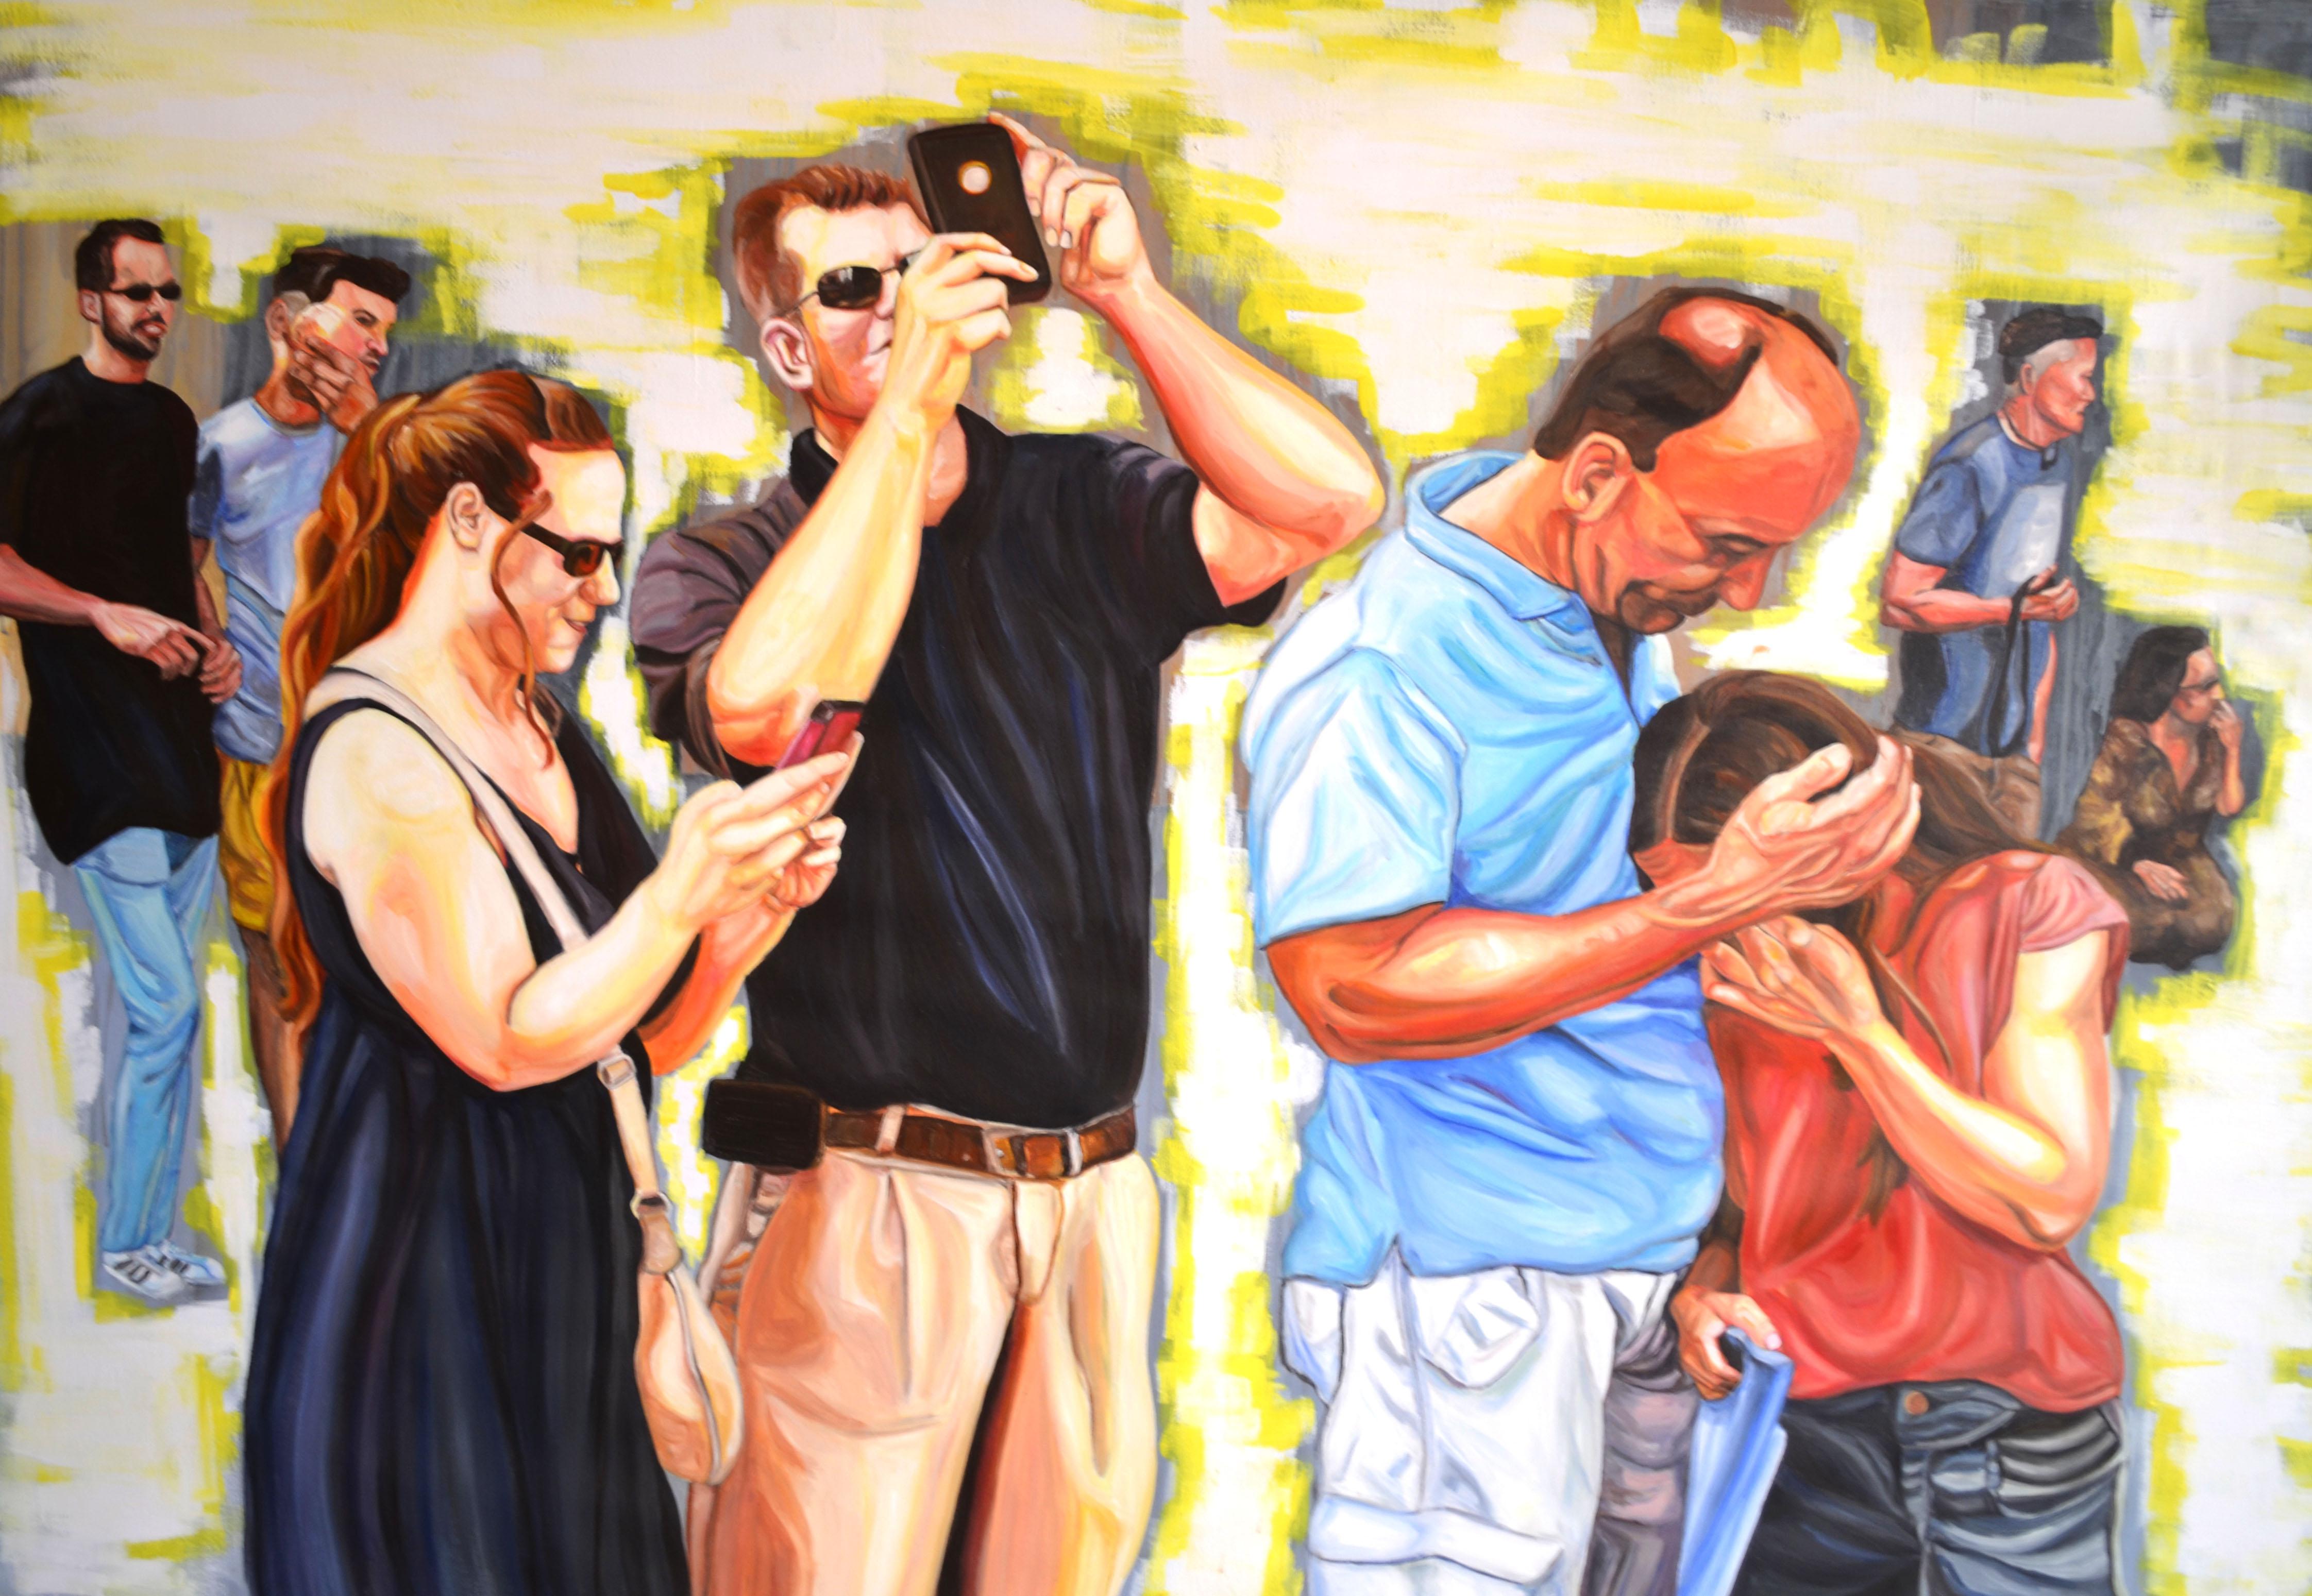 2016 mental busy 145 x 100 cm